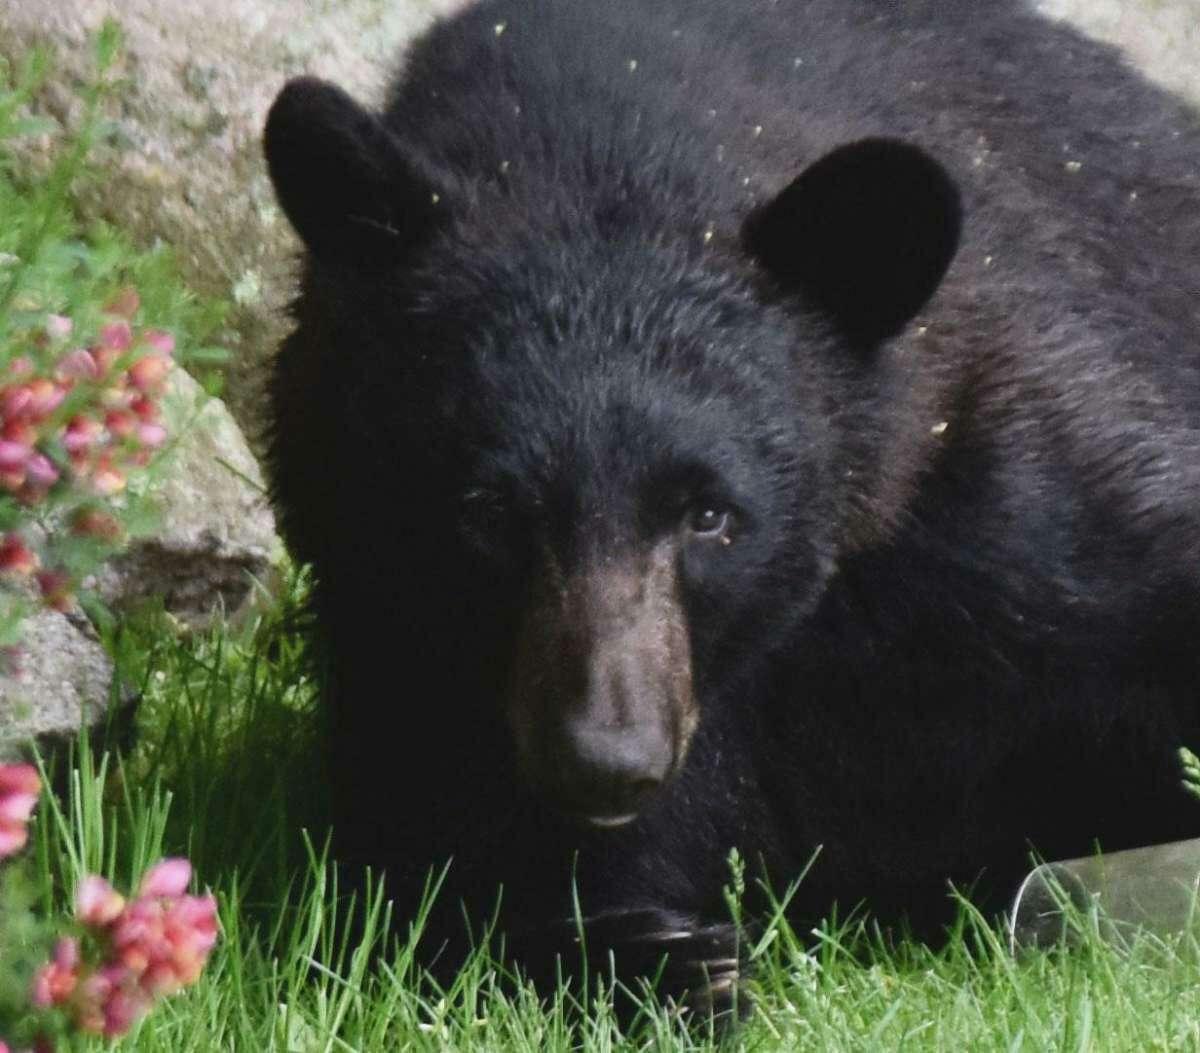 A black bear visits a Wilton, Conn., backyard near Cranbury Park in May 2019.